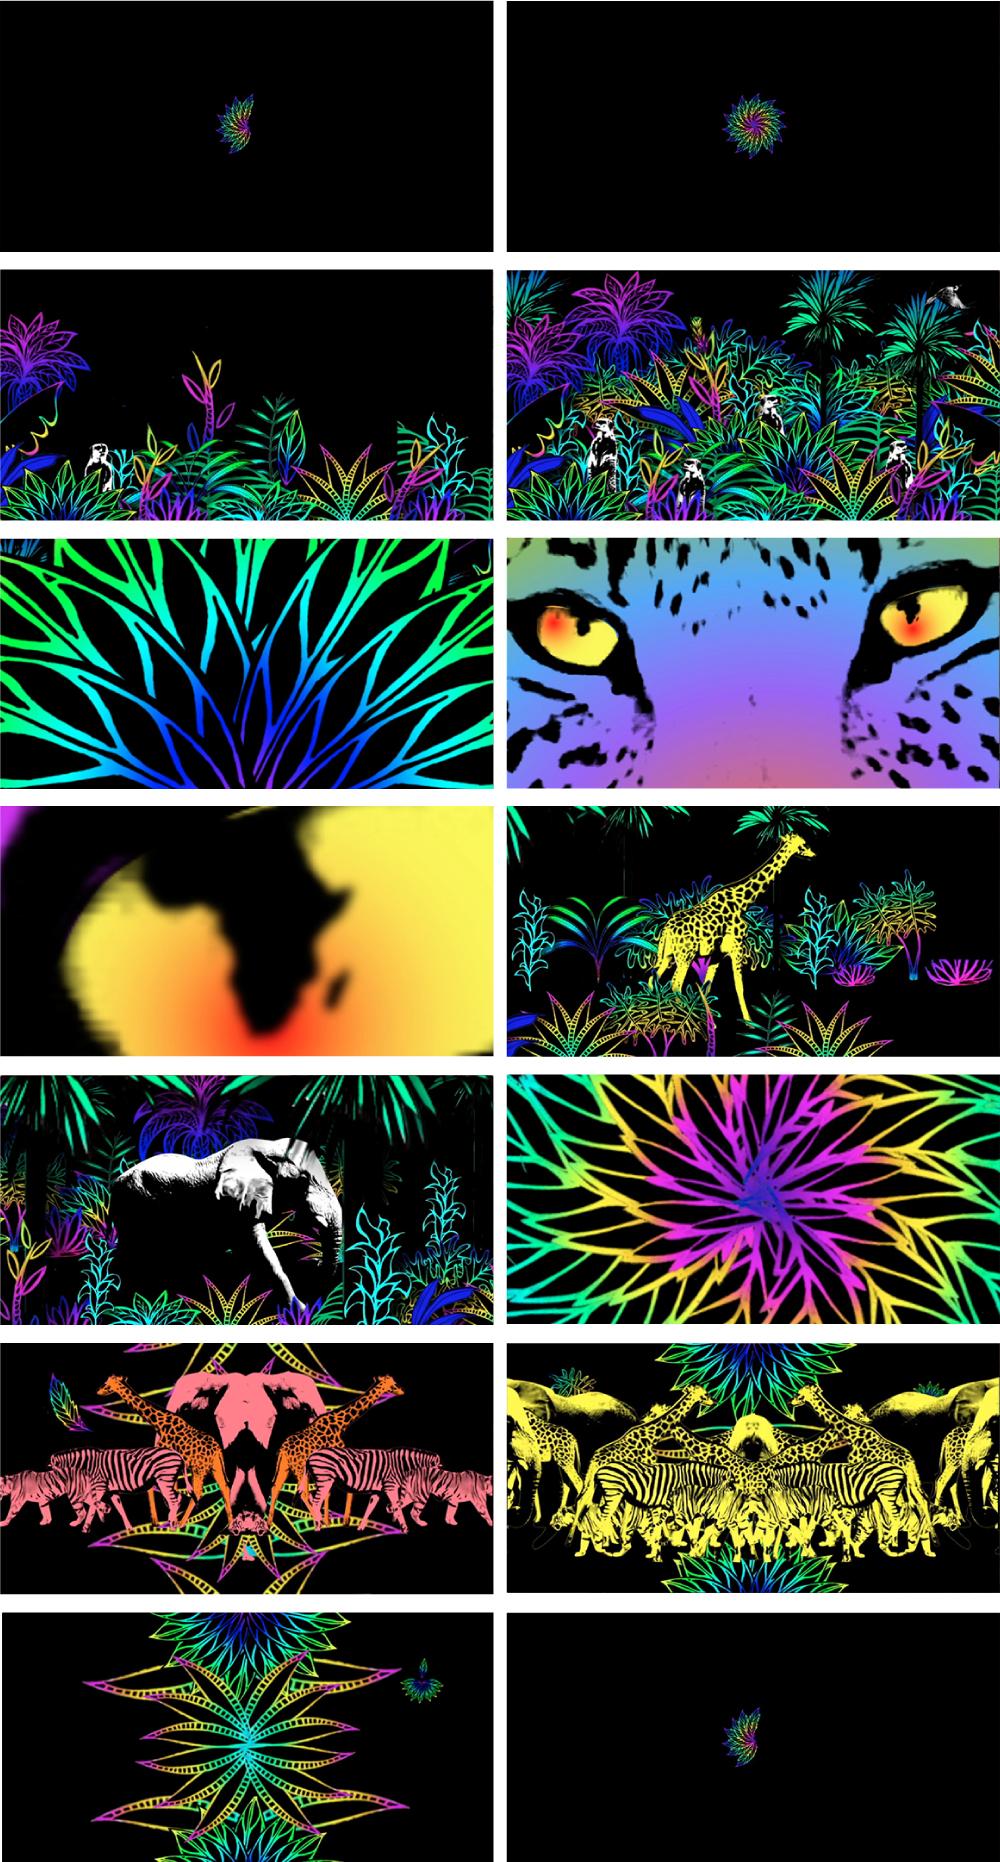 diseño 3 rico musica ska cubano tabu arte de disco ilustracion animacion ajiaco REMIX